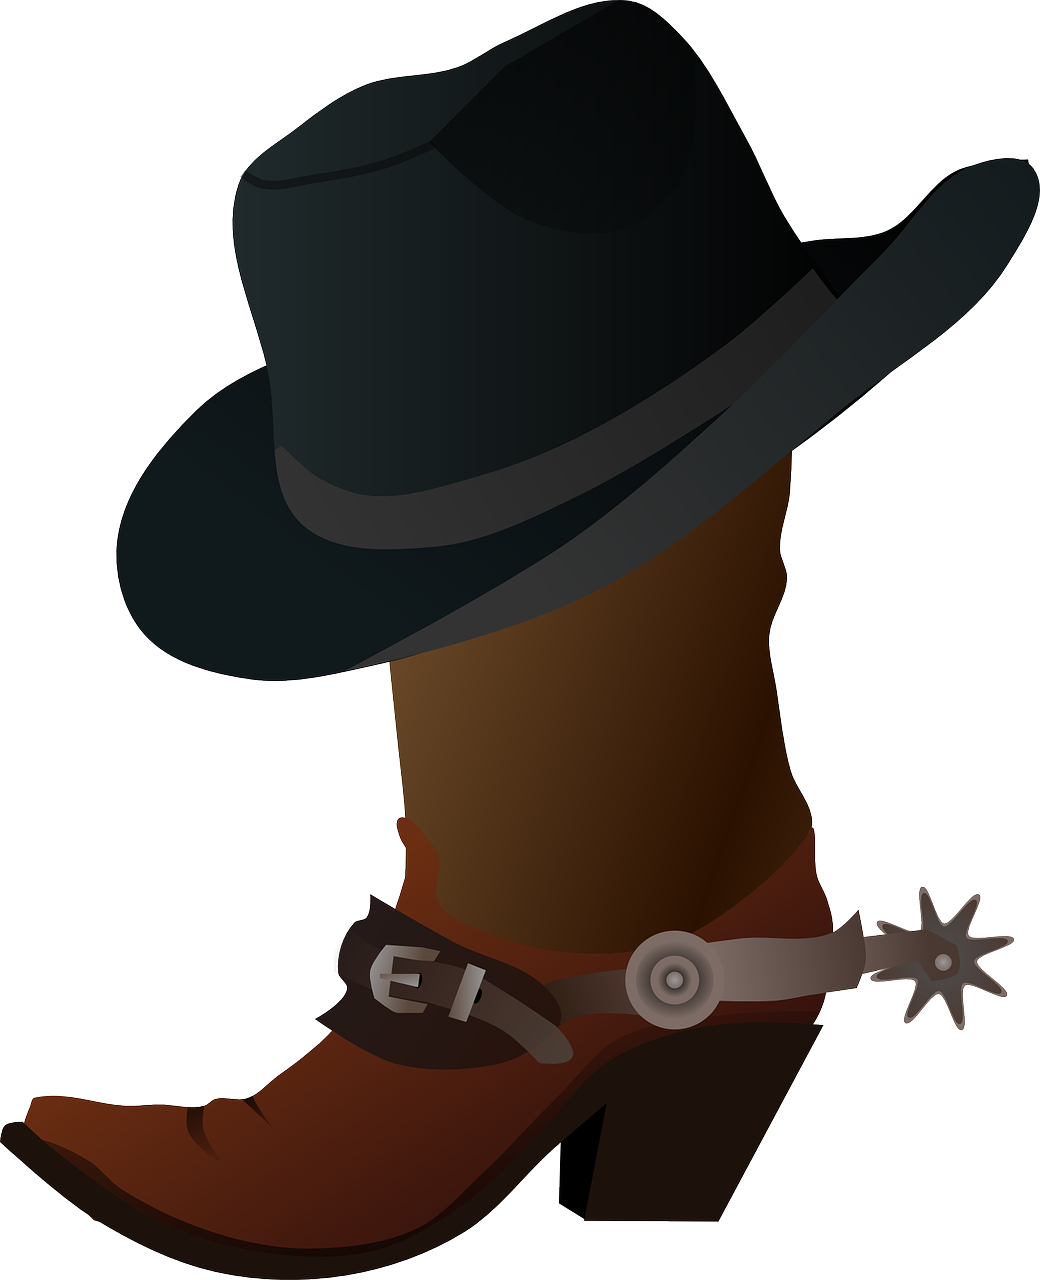 Free Image On Pixabay Spurs Cowboy Boots Hat Clothing Crochet Cowboy Boots Cowboy Cowboy Hats